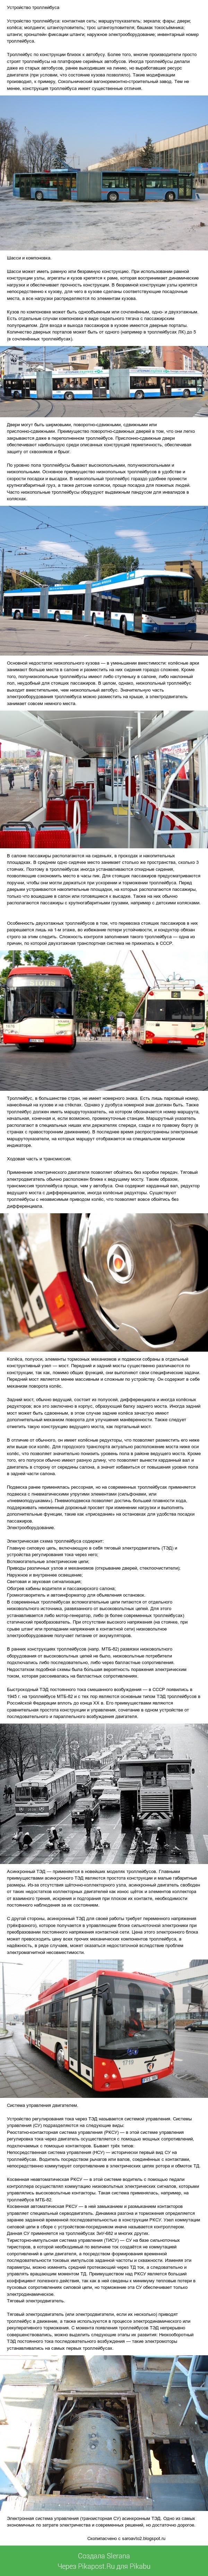 Все о троллейбусе (Часть 5) Копипаста, Троллейбус, Длиннопост